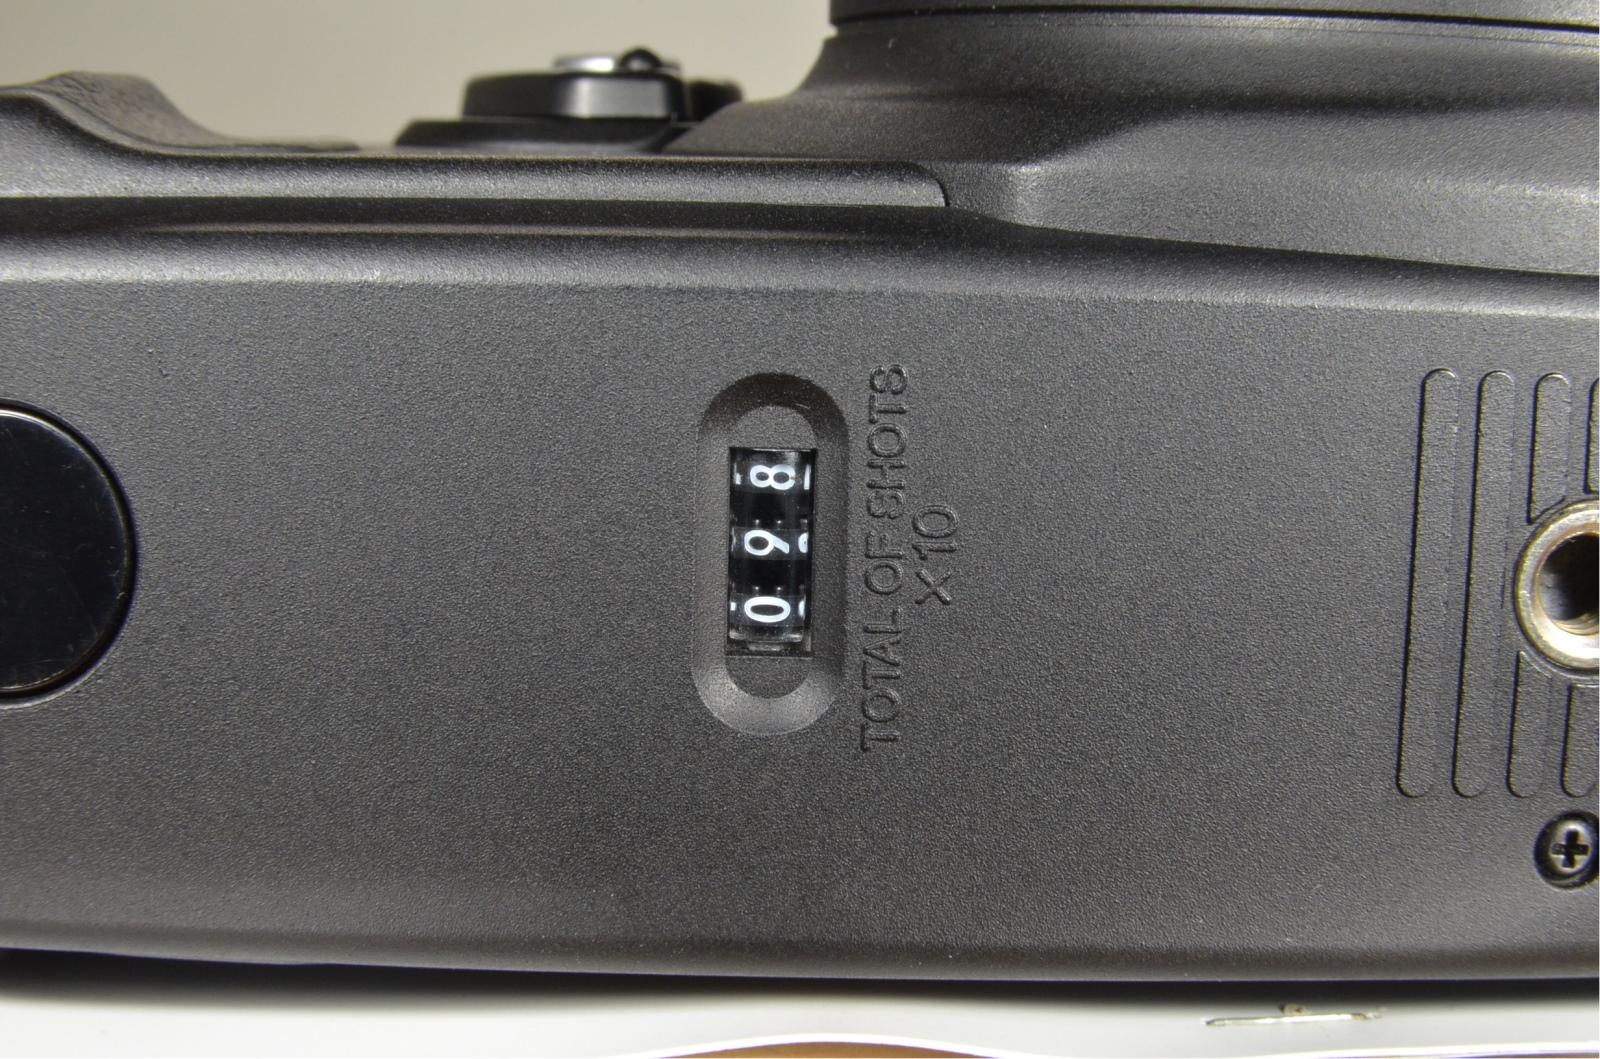 fuji fujifilm gw690iii 90mm f3.5 medium format count only '098' rare!